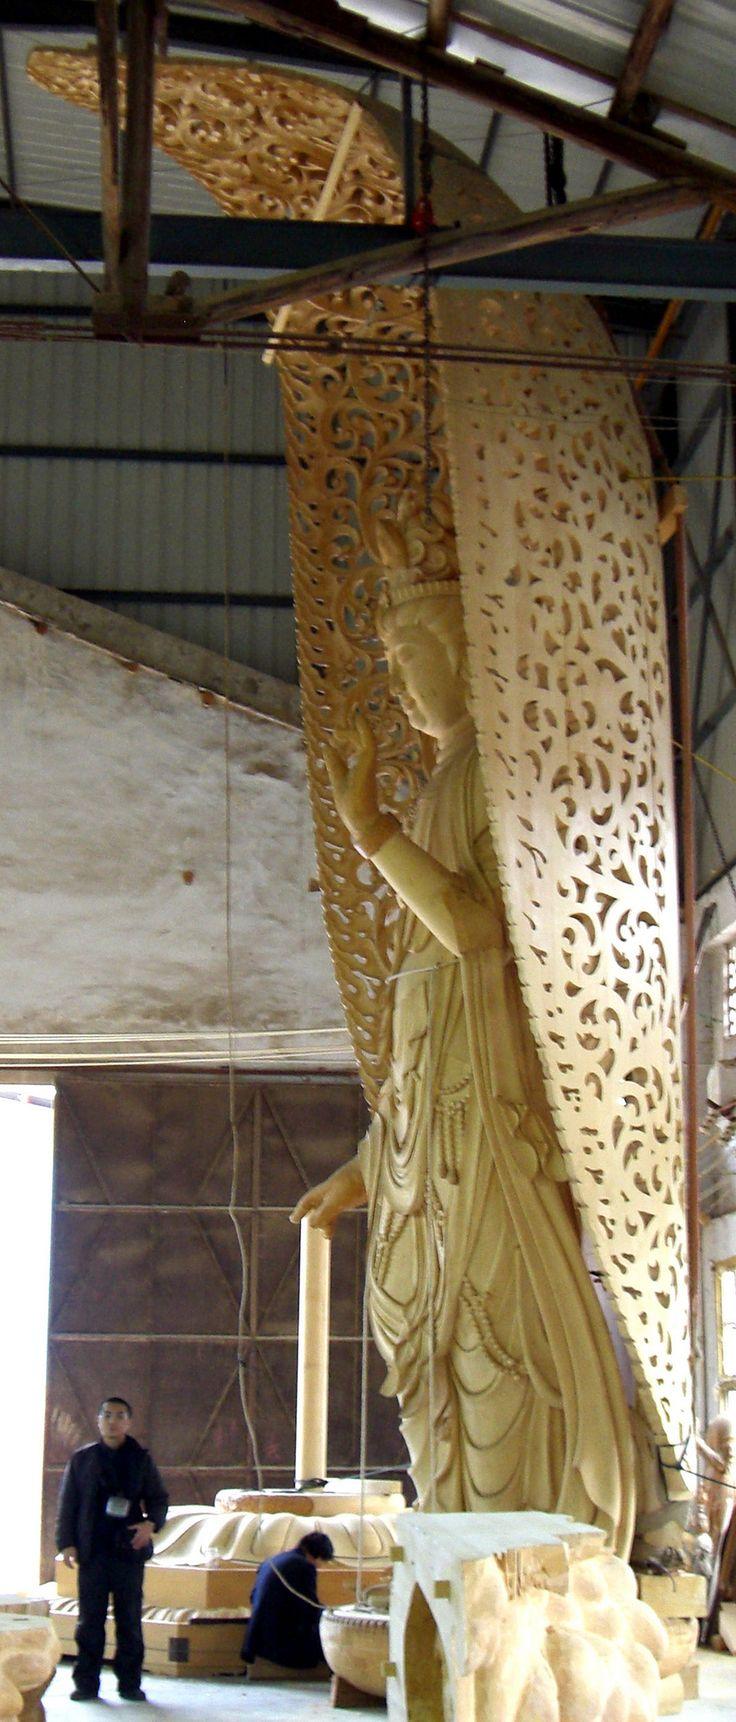 "https://flic.kr/p/eeKKm6 | Buddhist statue 仏像 - 念佛宗(念仏宗無量寿寺) 観音堂007 | www.youtube.com/user/asusume www.facebook.com/Nenbutsushu www.nenbutsushuart.tumblr.com/ www.nenbutsushu.or.jp/ Nenbutsushu Sanpouzan Muryojuji ""The Royal Grand Hall of Buddhism""  念佛宗(念仏宗無量寿寺) 総本山 兵庫県加東市"